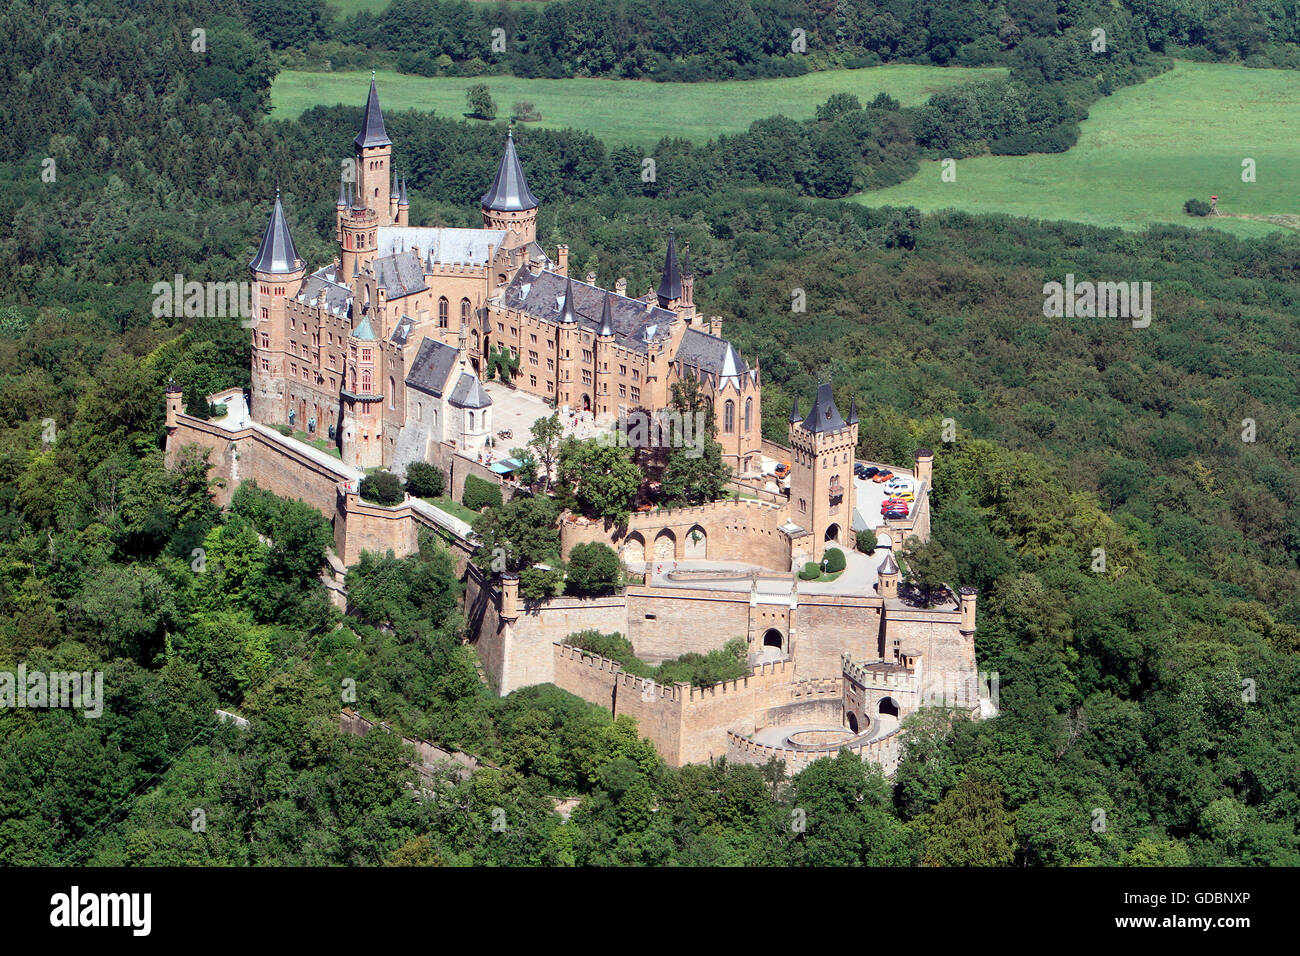 Castle Hohenzollern Hechingen Baden Wurttemberg Germany